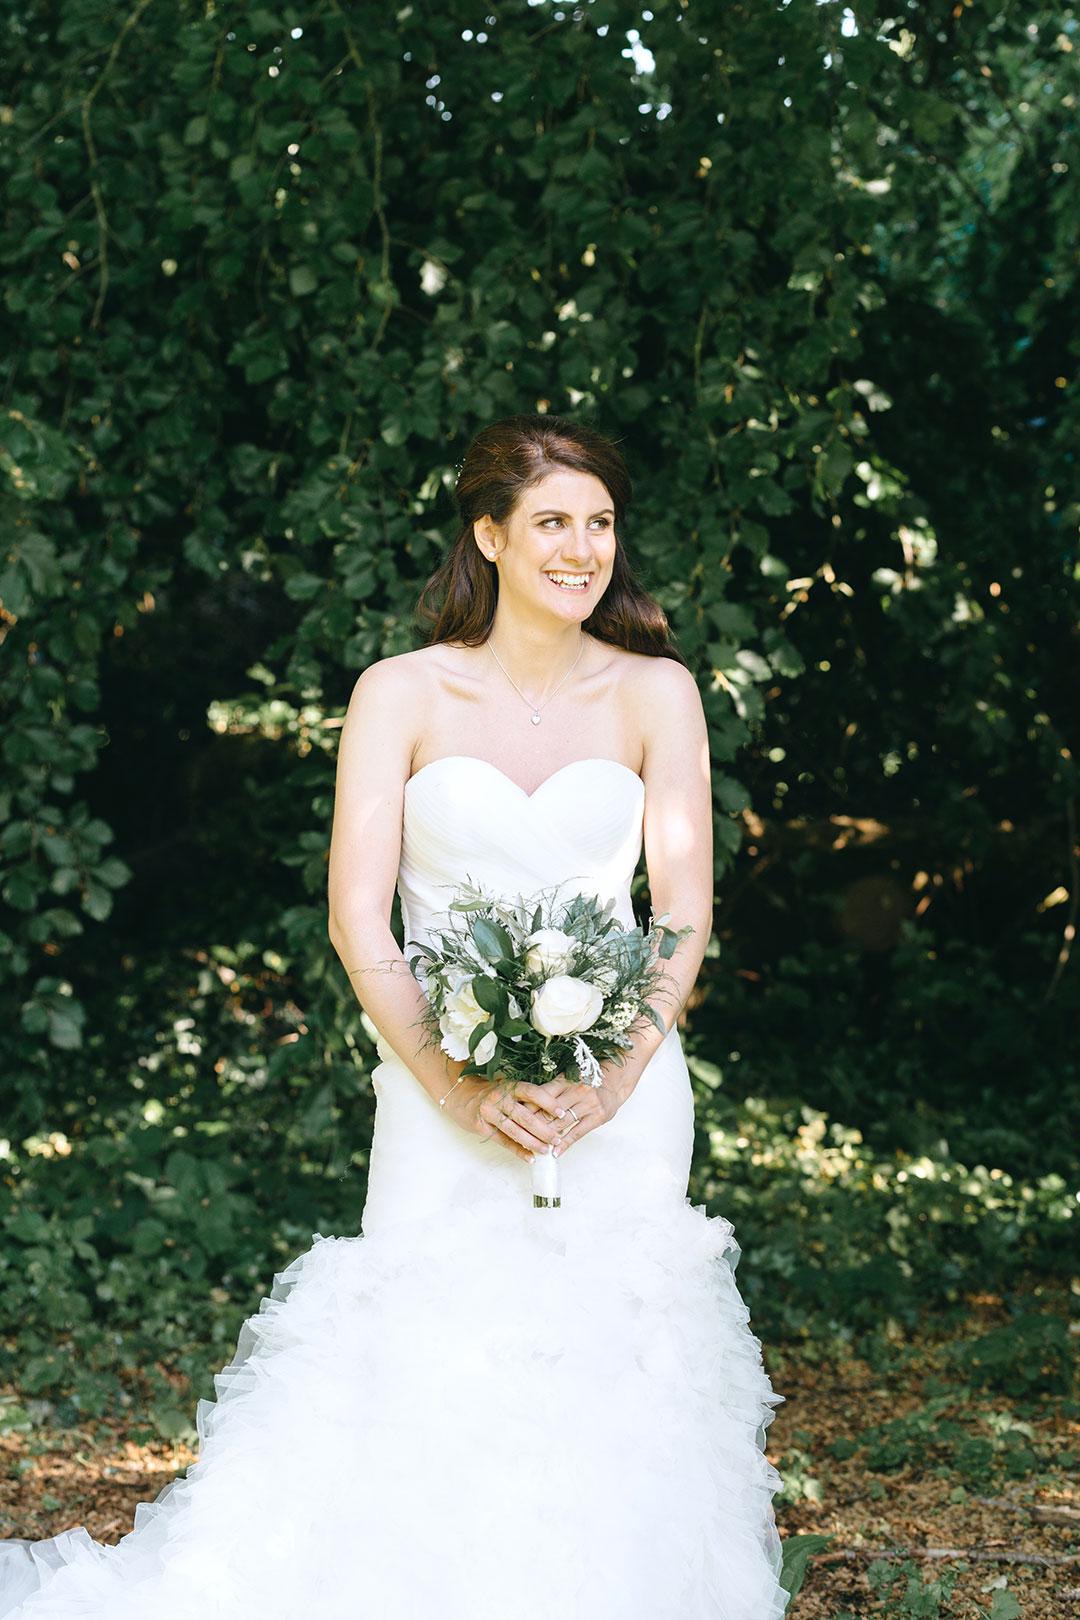 bellinter-house-wedding-photographer-0134_0134.jpg